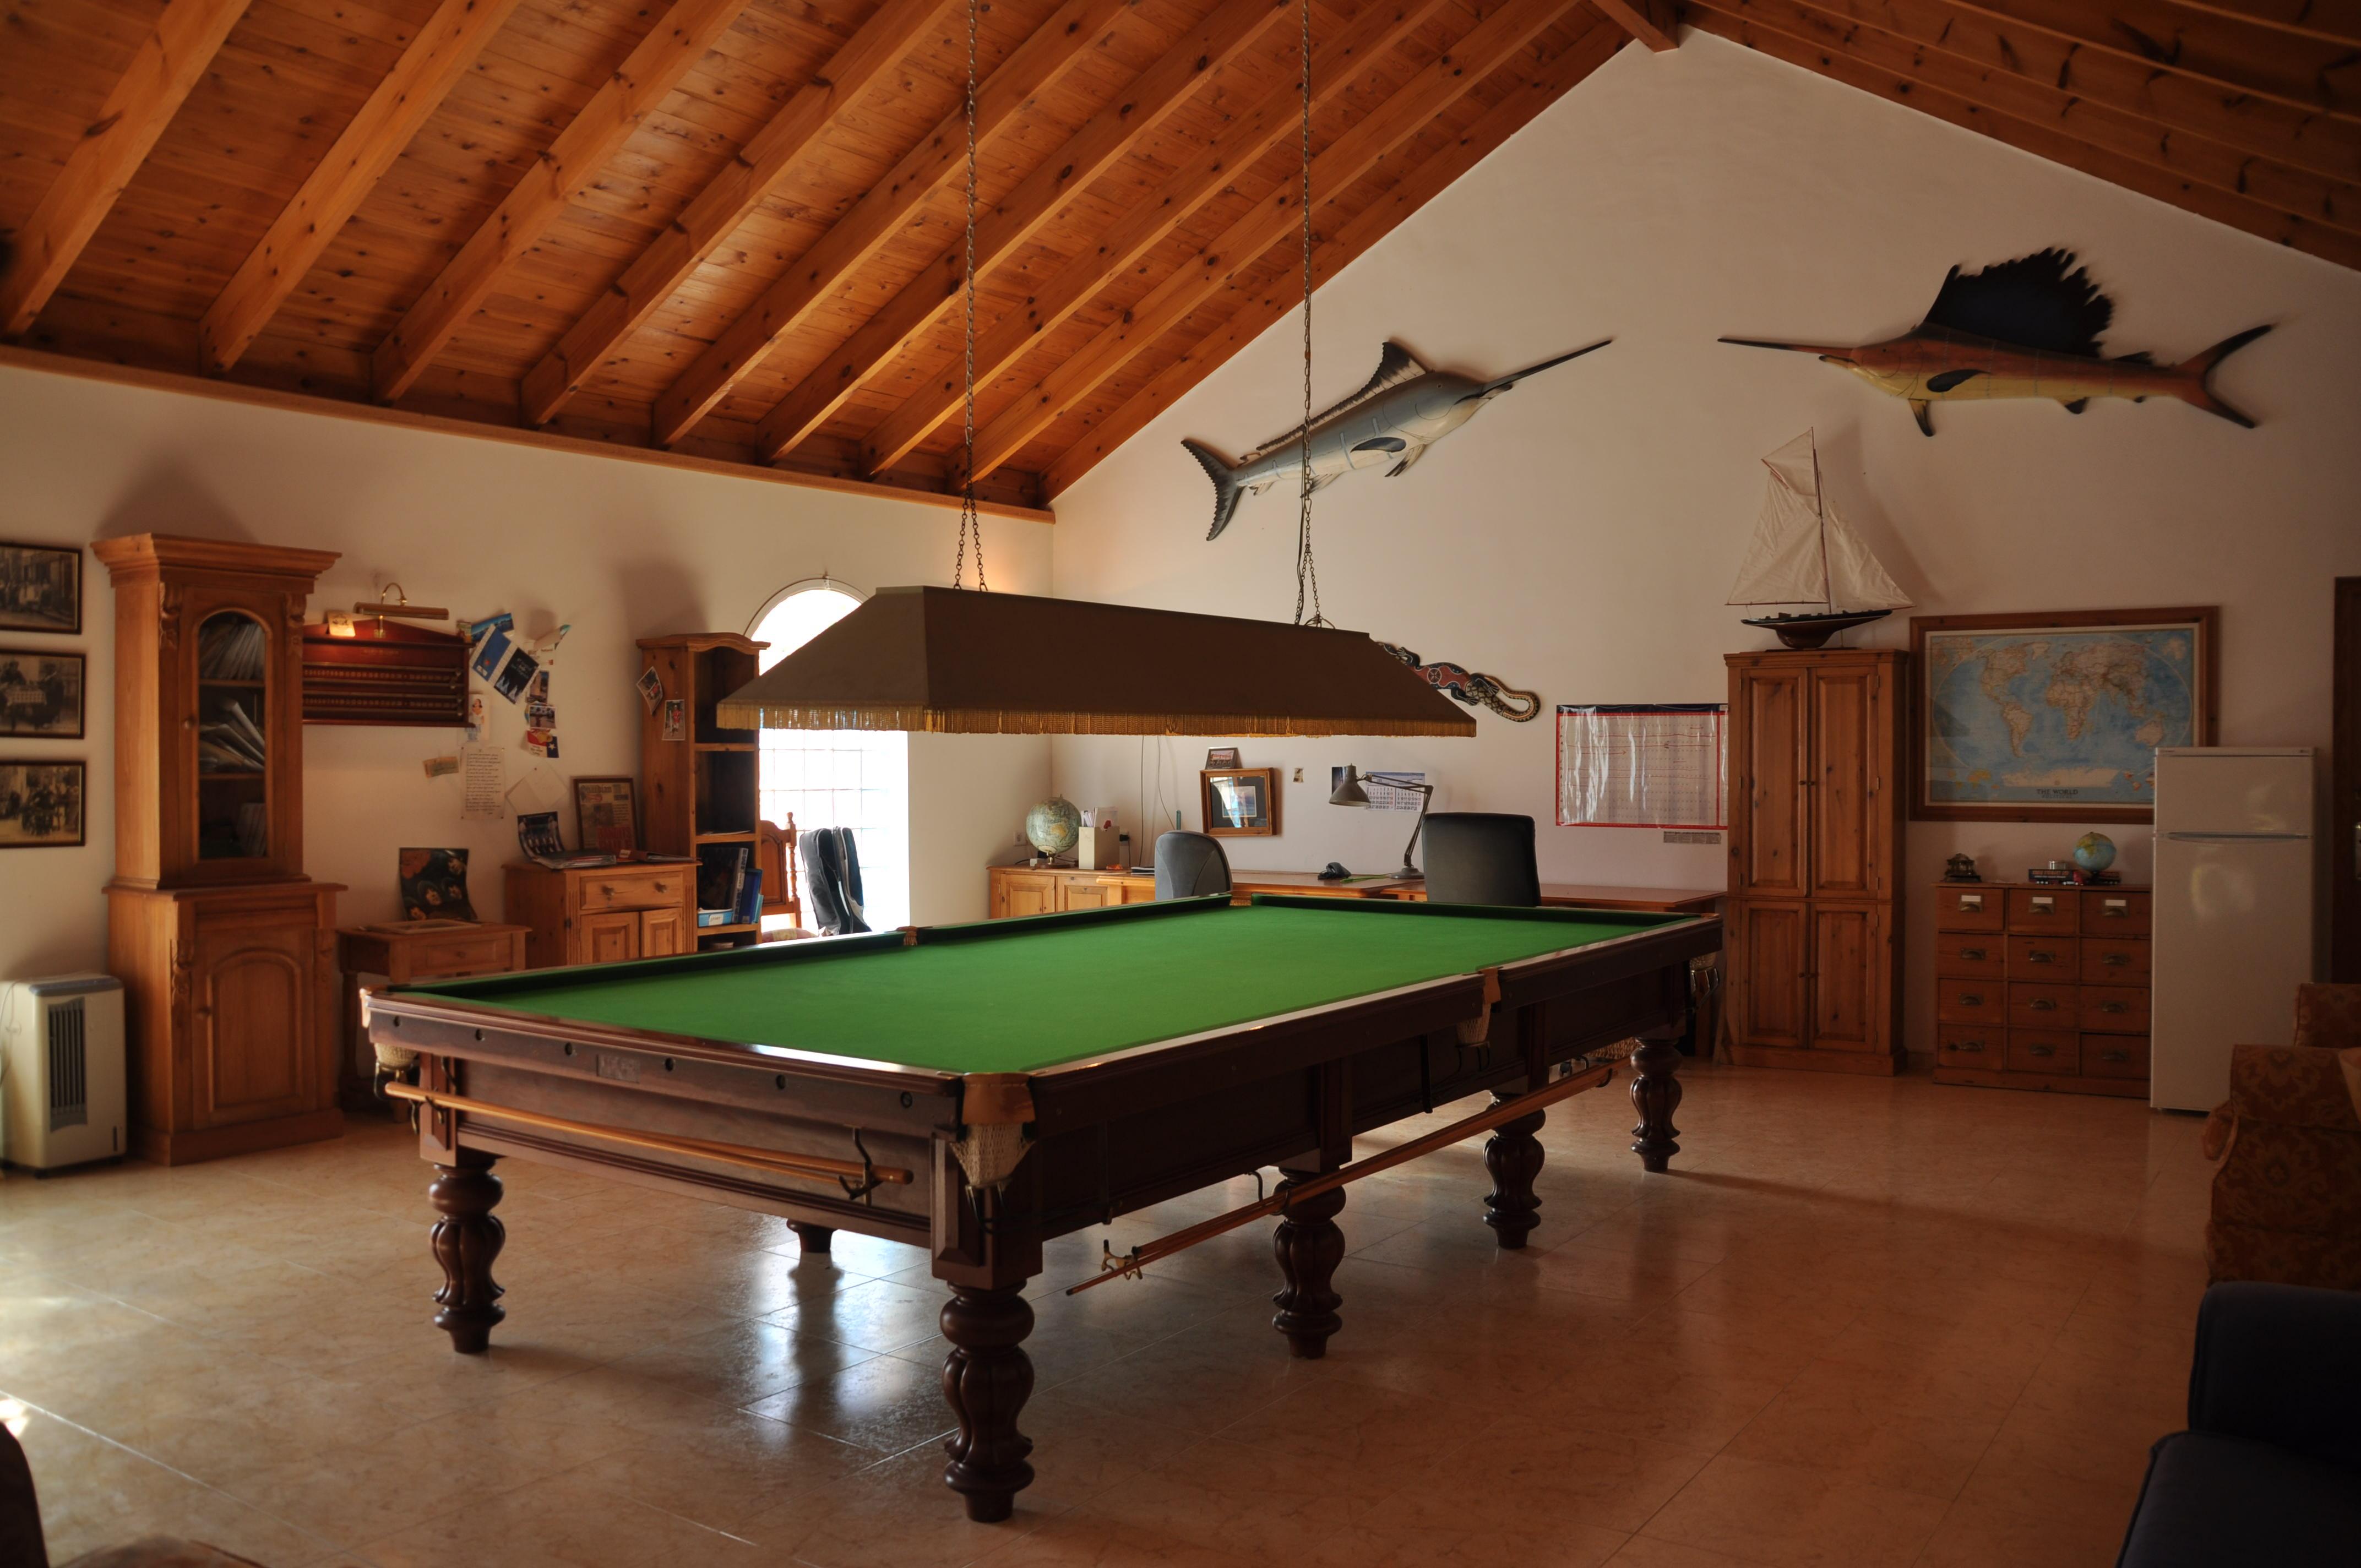 Fullsizesnookertablewithallaccessoriesavailableinsalelas - Full size snooker table for sale